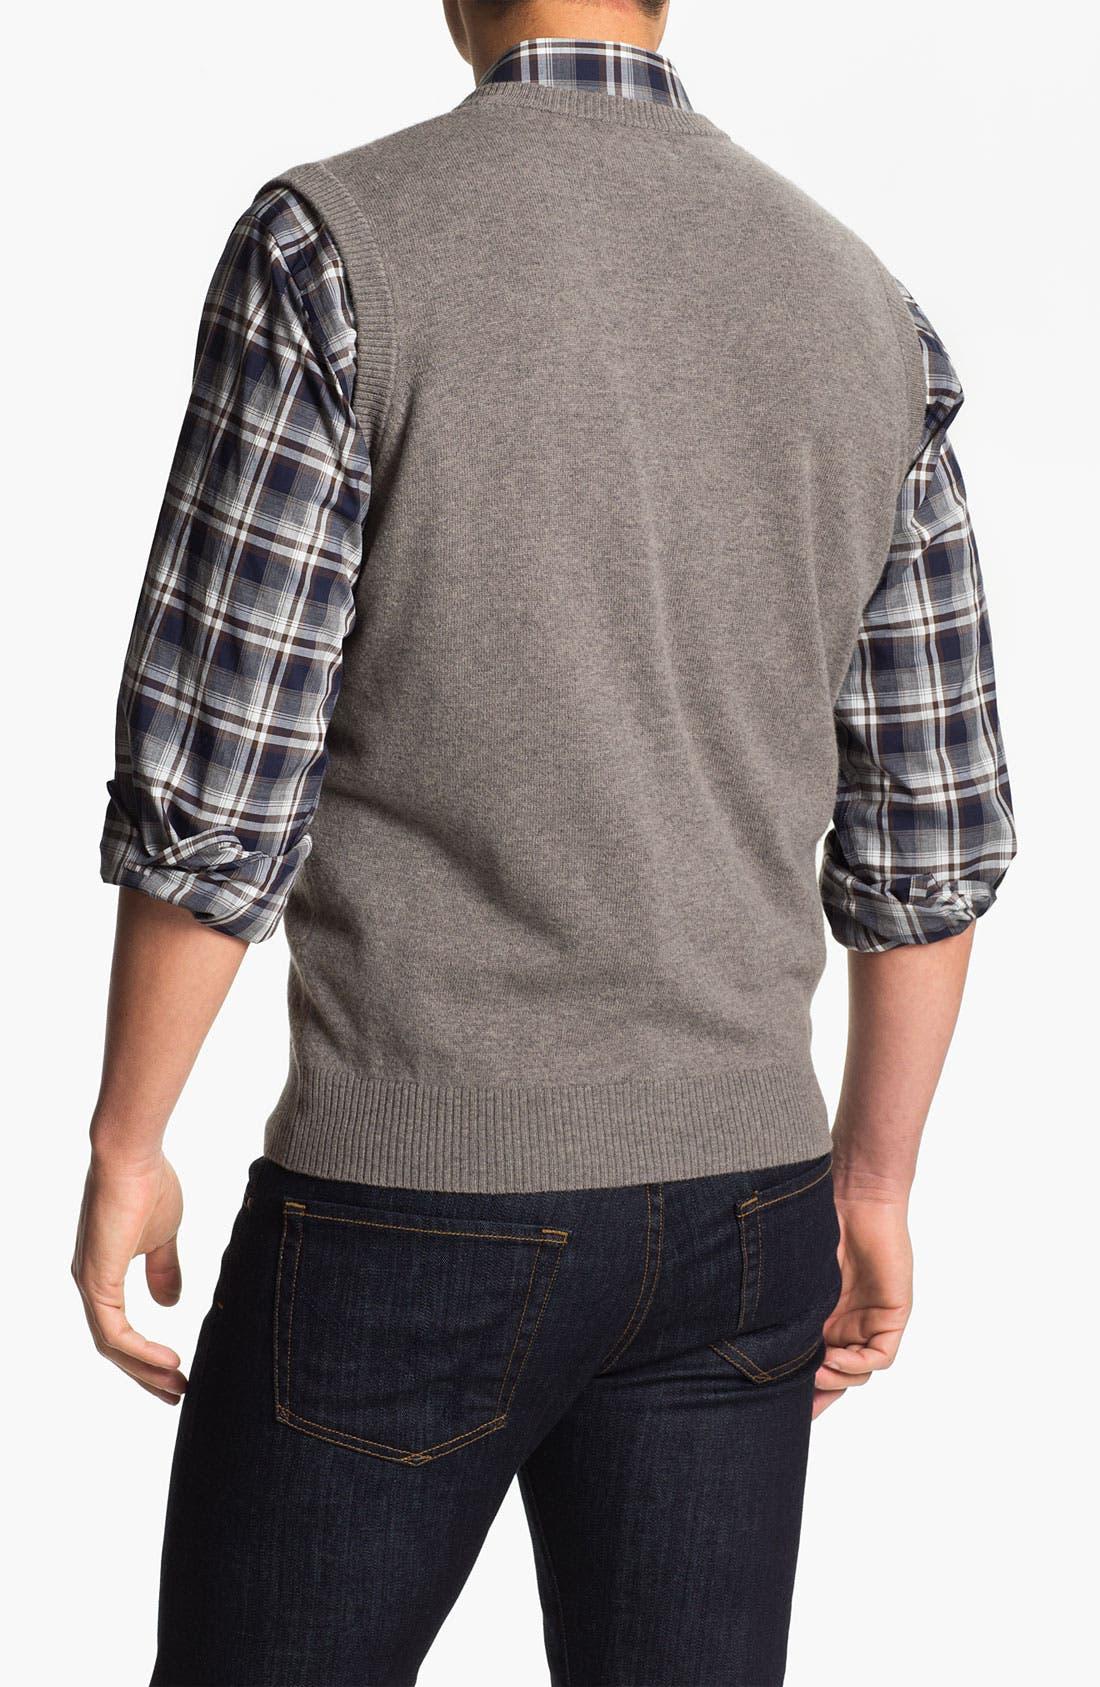 FRANCO DANTI,                             V-Neck Wool Sweater Vest,                             Alternate thumbnail 2, color,                             200